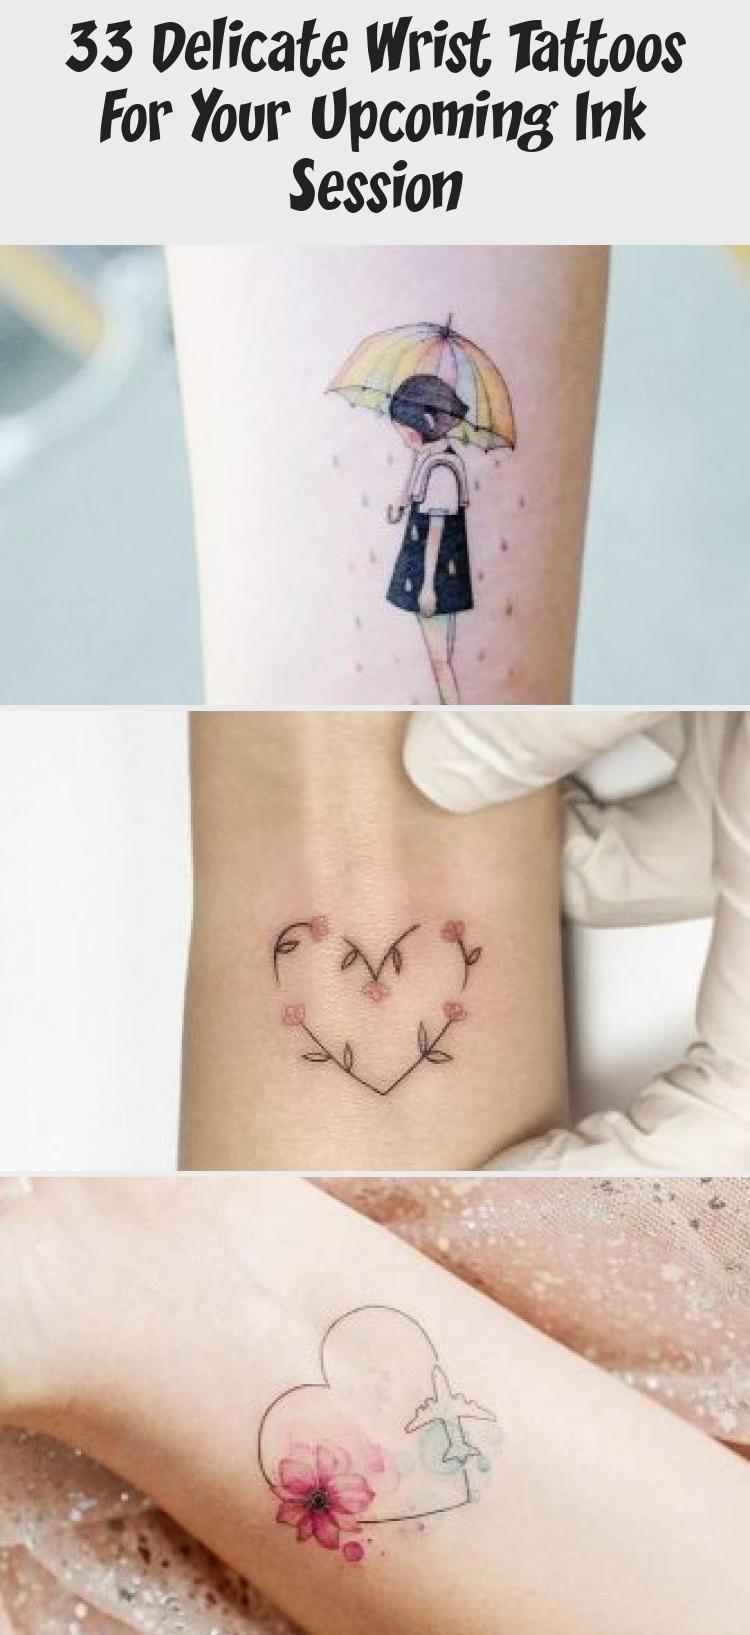 10+ Amazing Feminine wrist tattoos with meaning image ideas